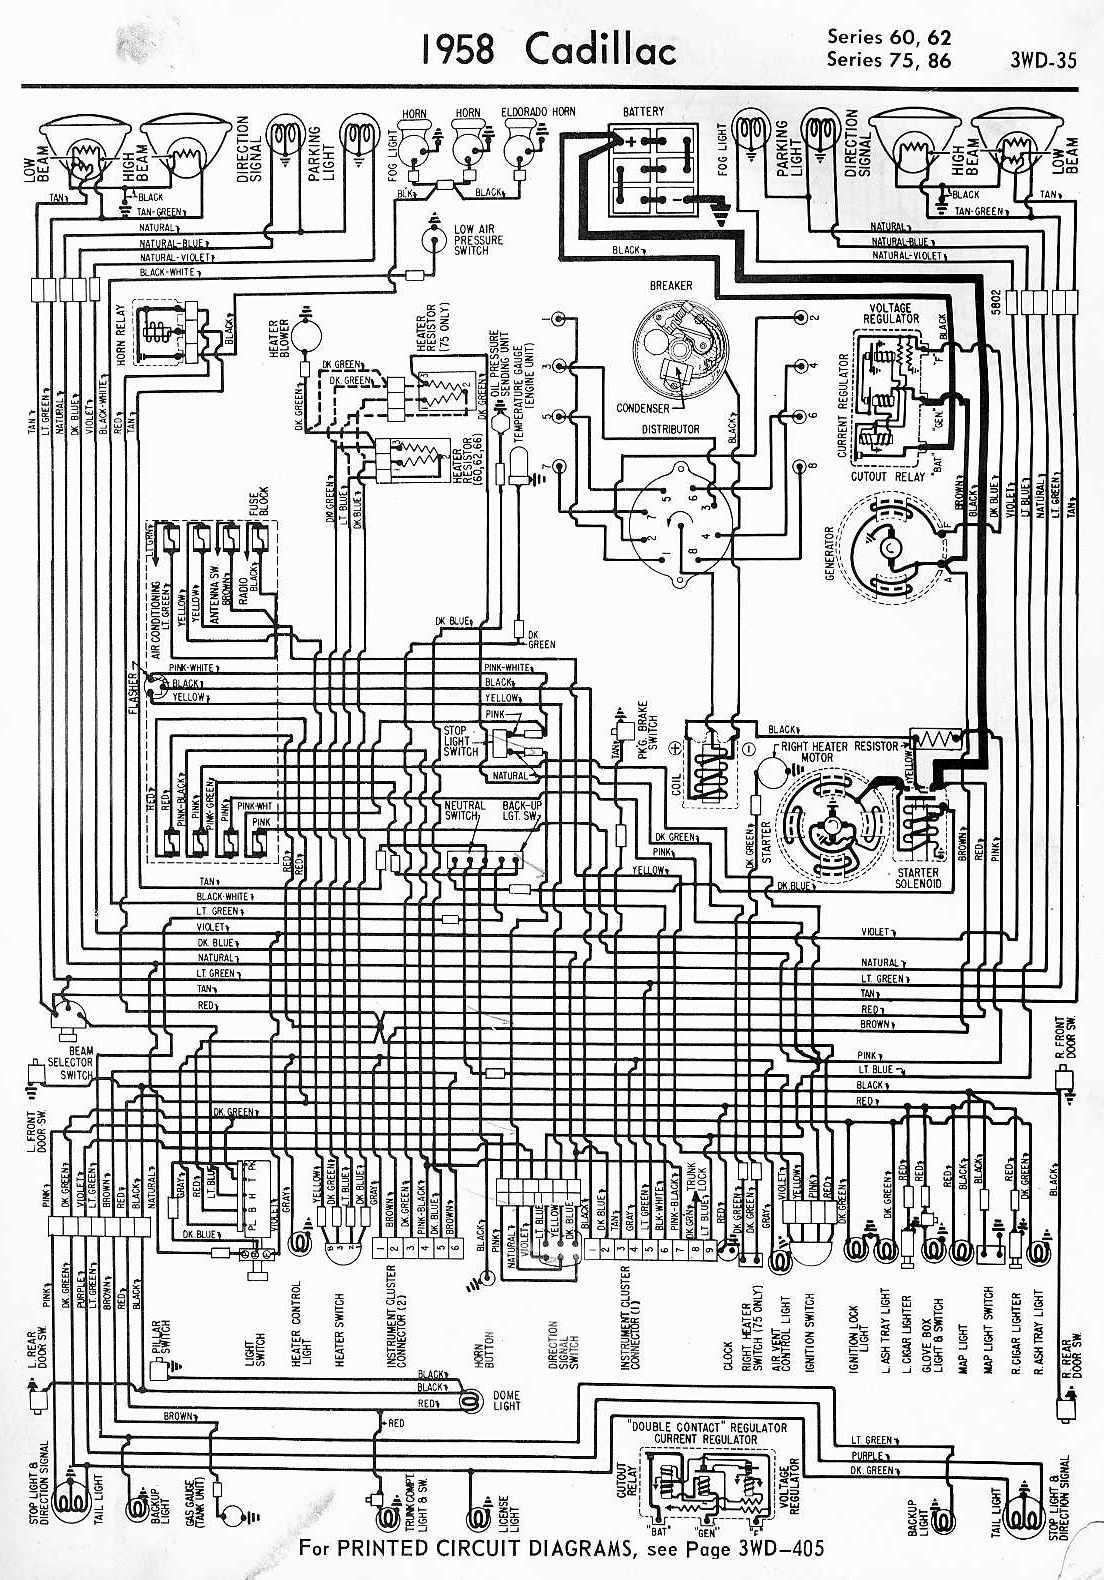 medium resolution of 1968 cadillac air conditioner wiring diagram simple wiring schema 1994 cadillac deville speaker wiring diagram 1979 cadillac deville wiring diagram